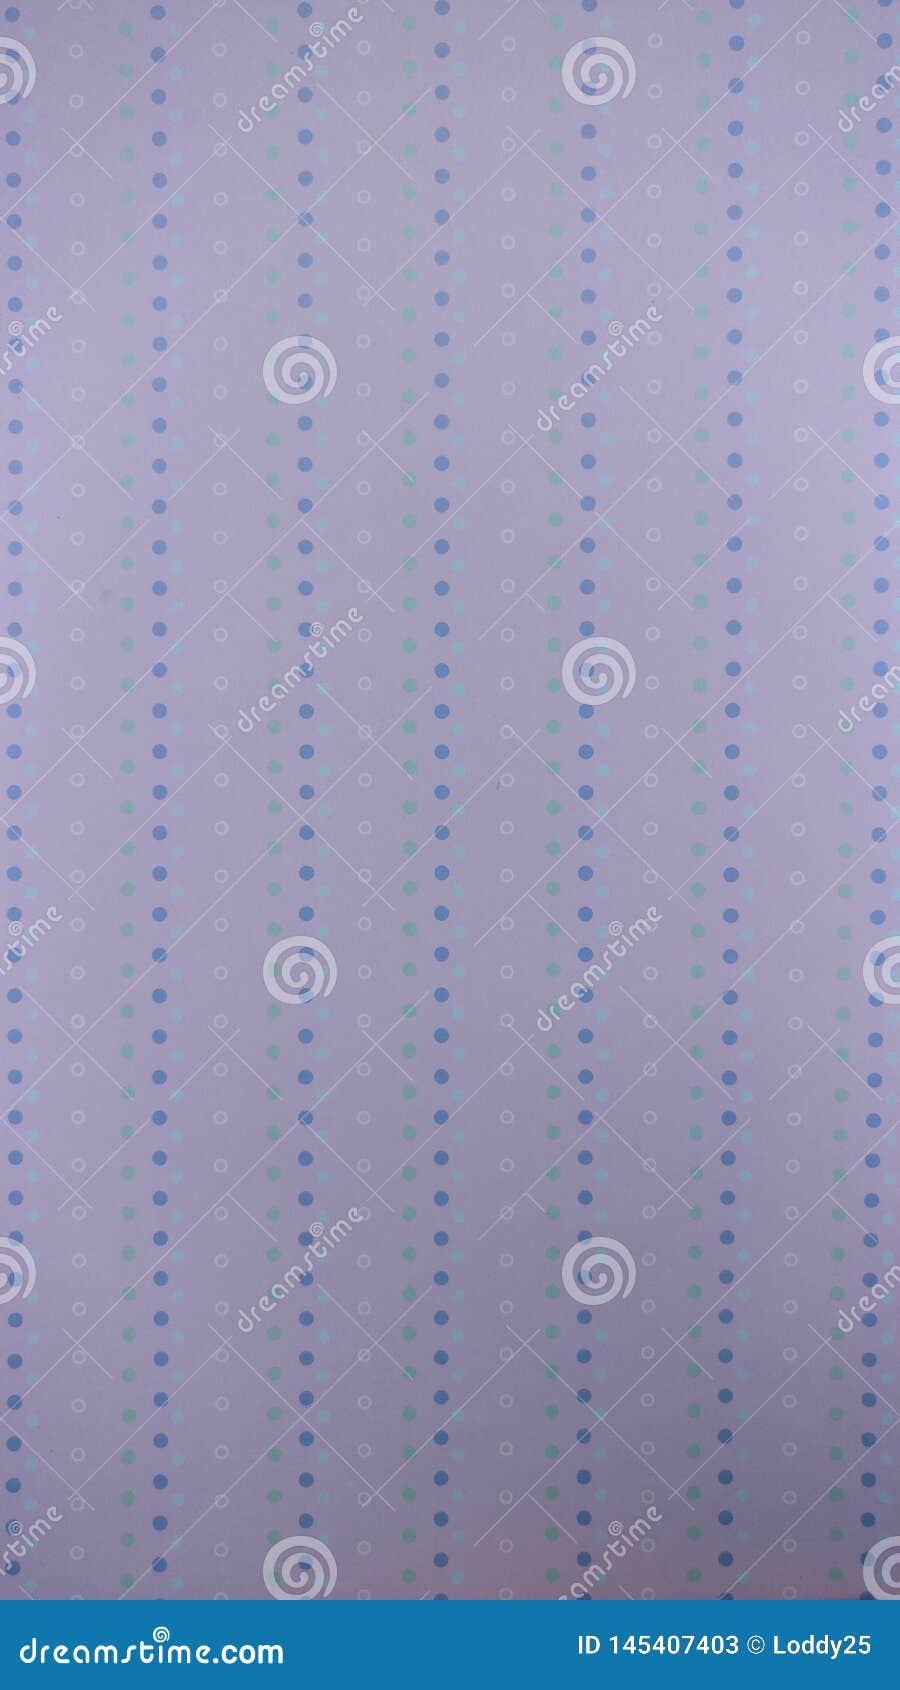 Spotty Wallpaper design